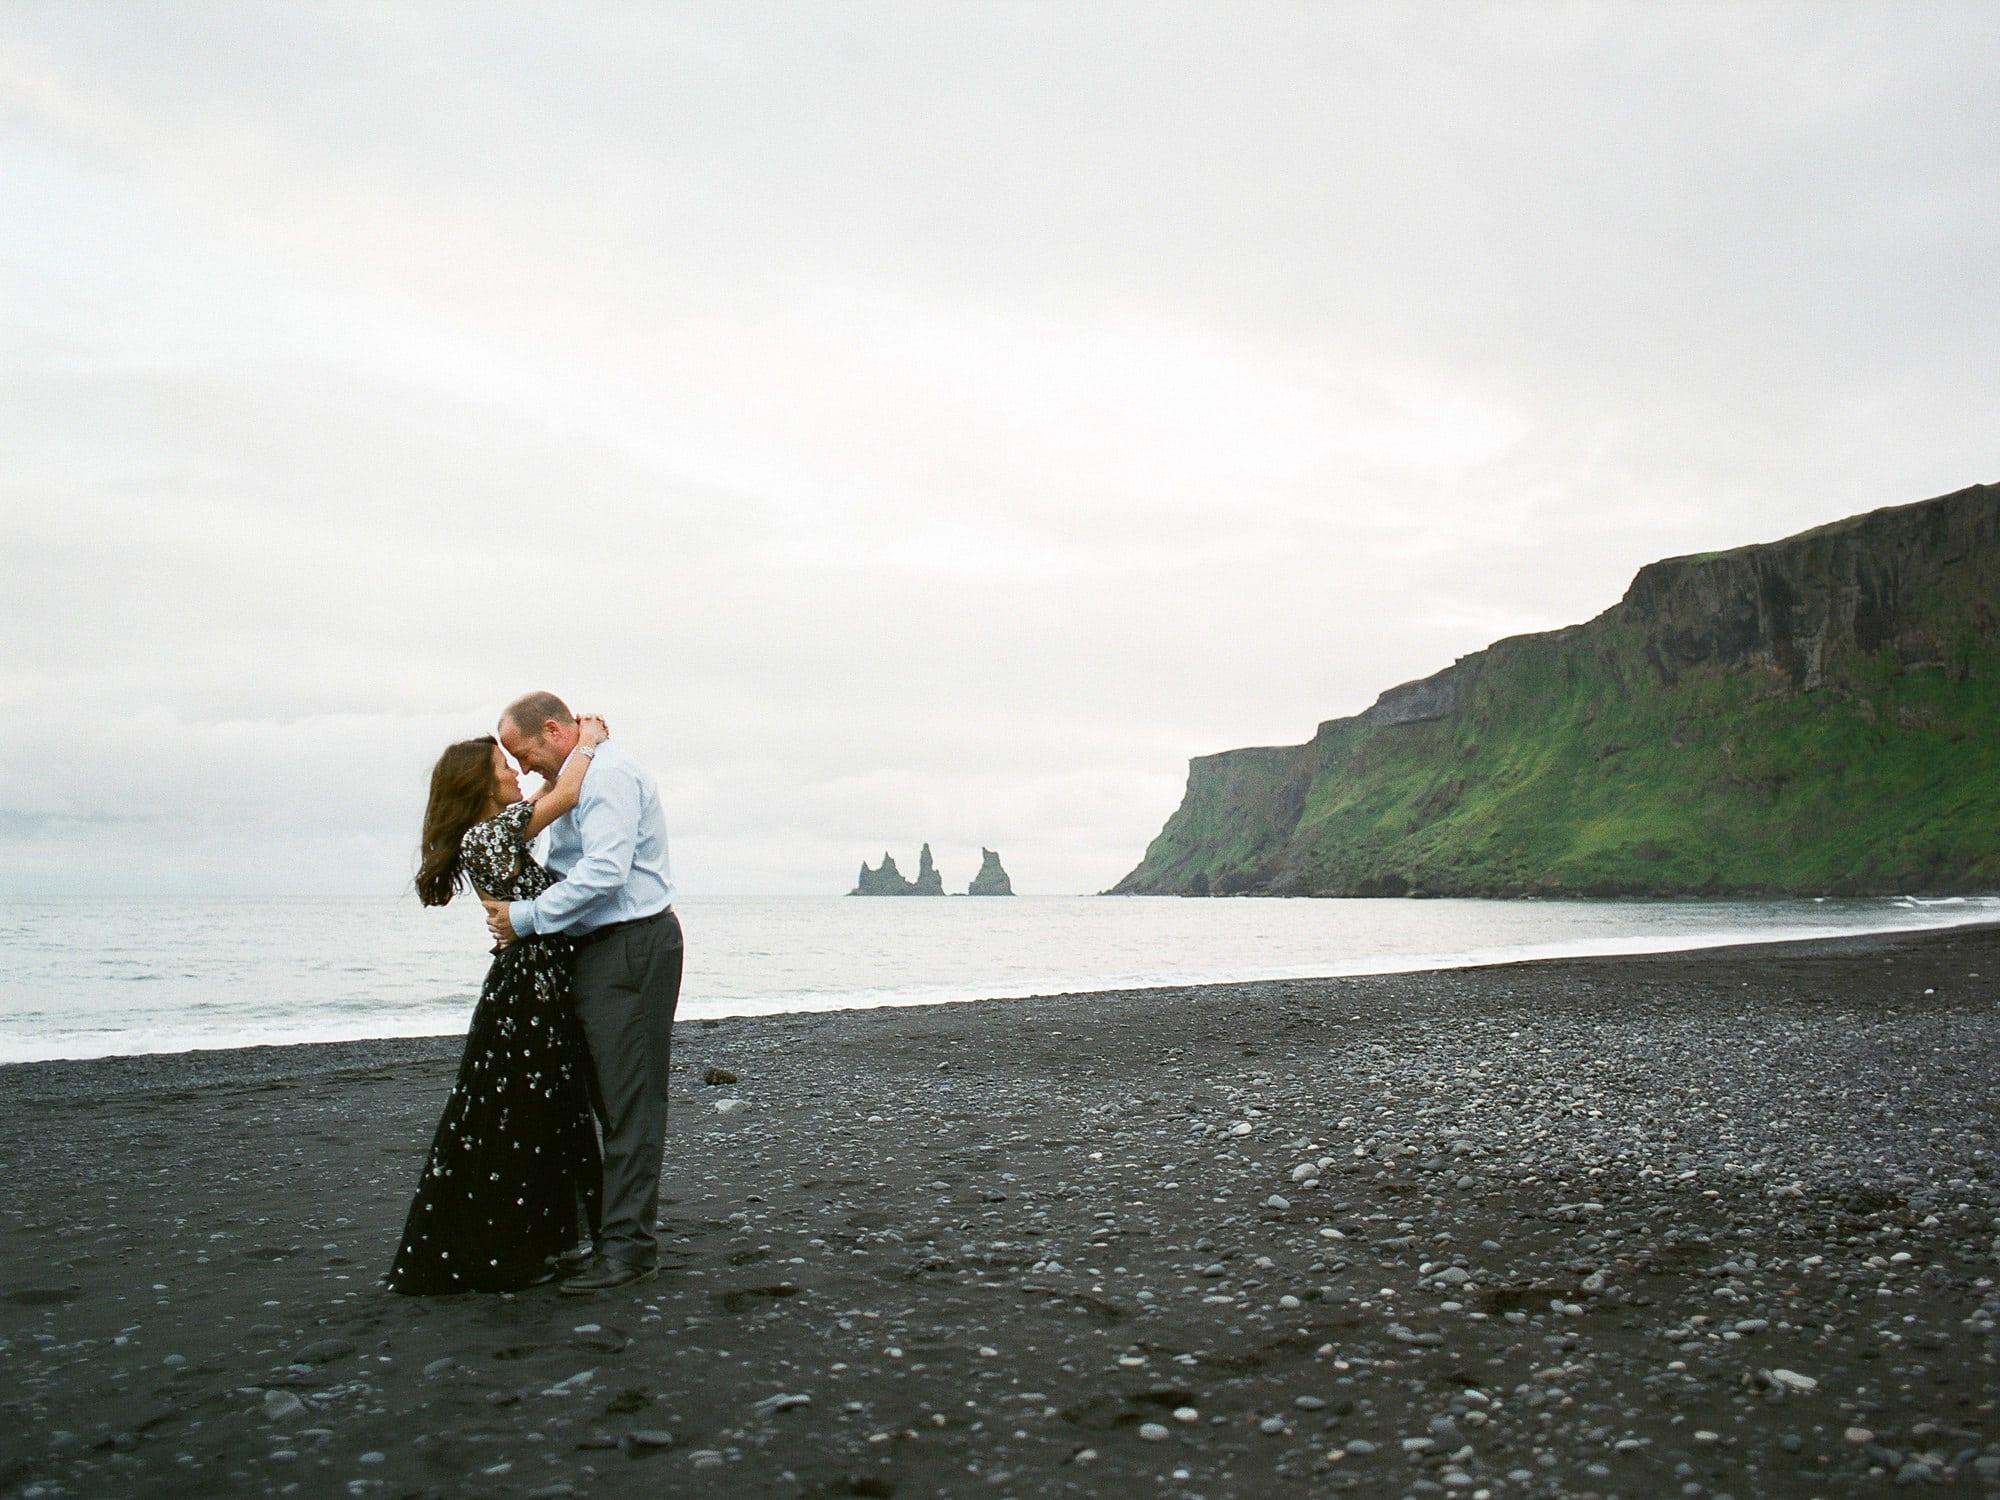 fotograaf ijsland